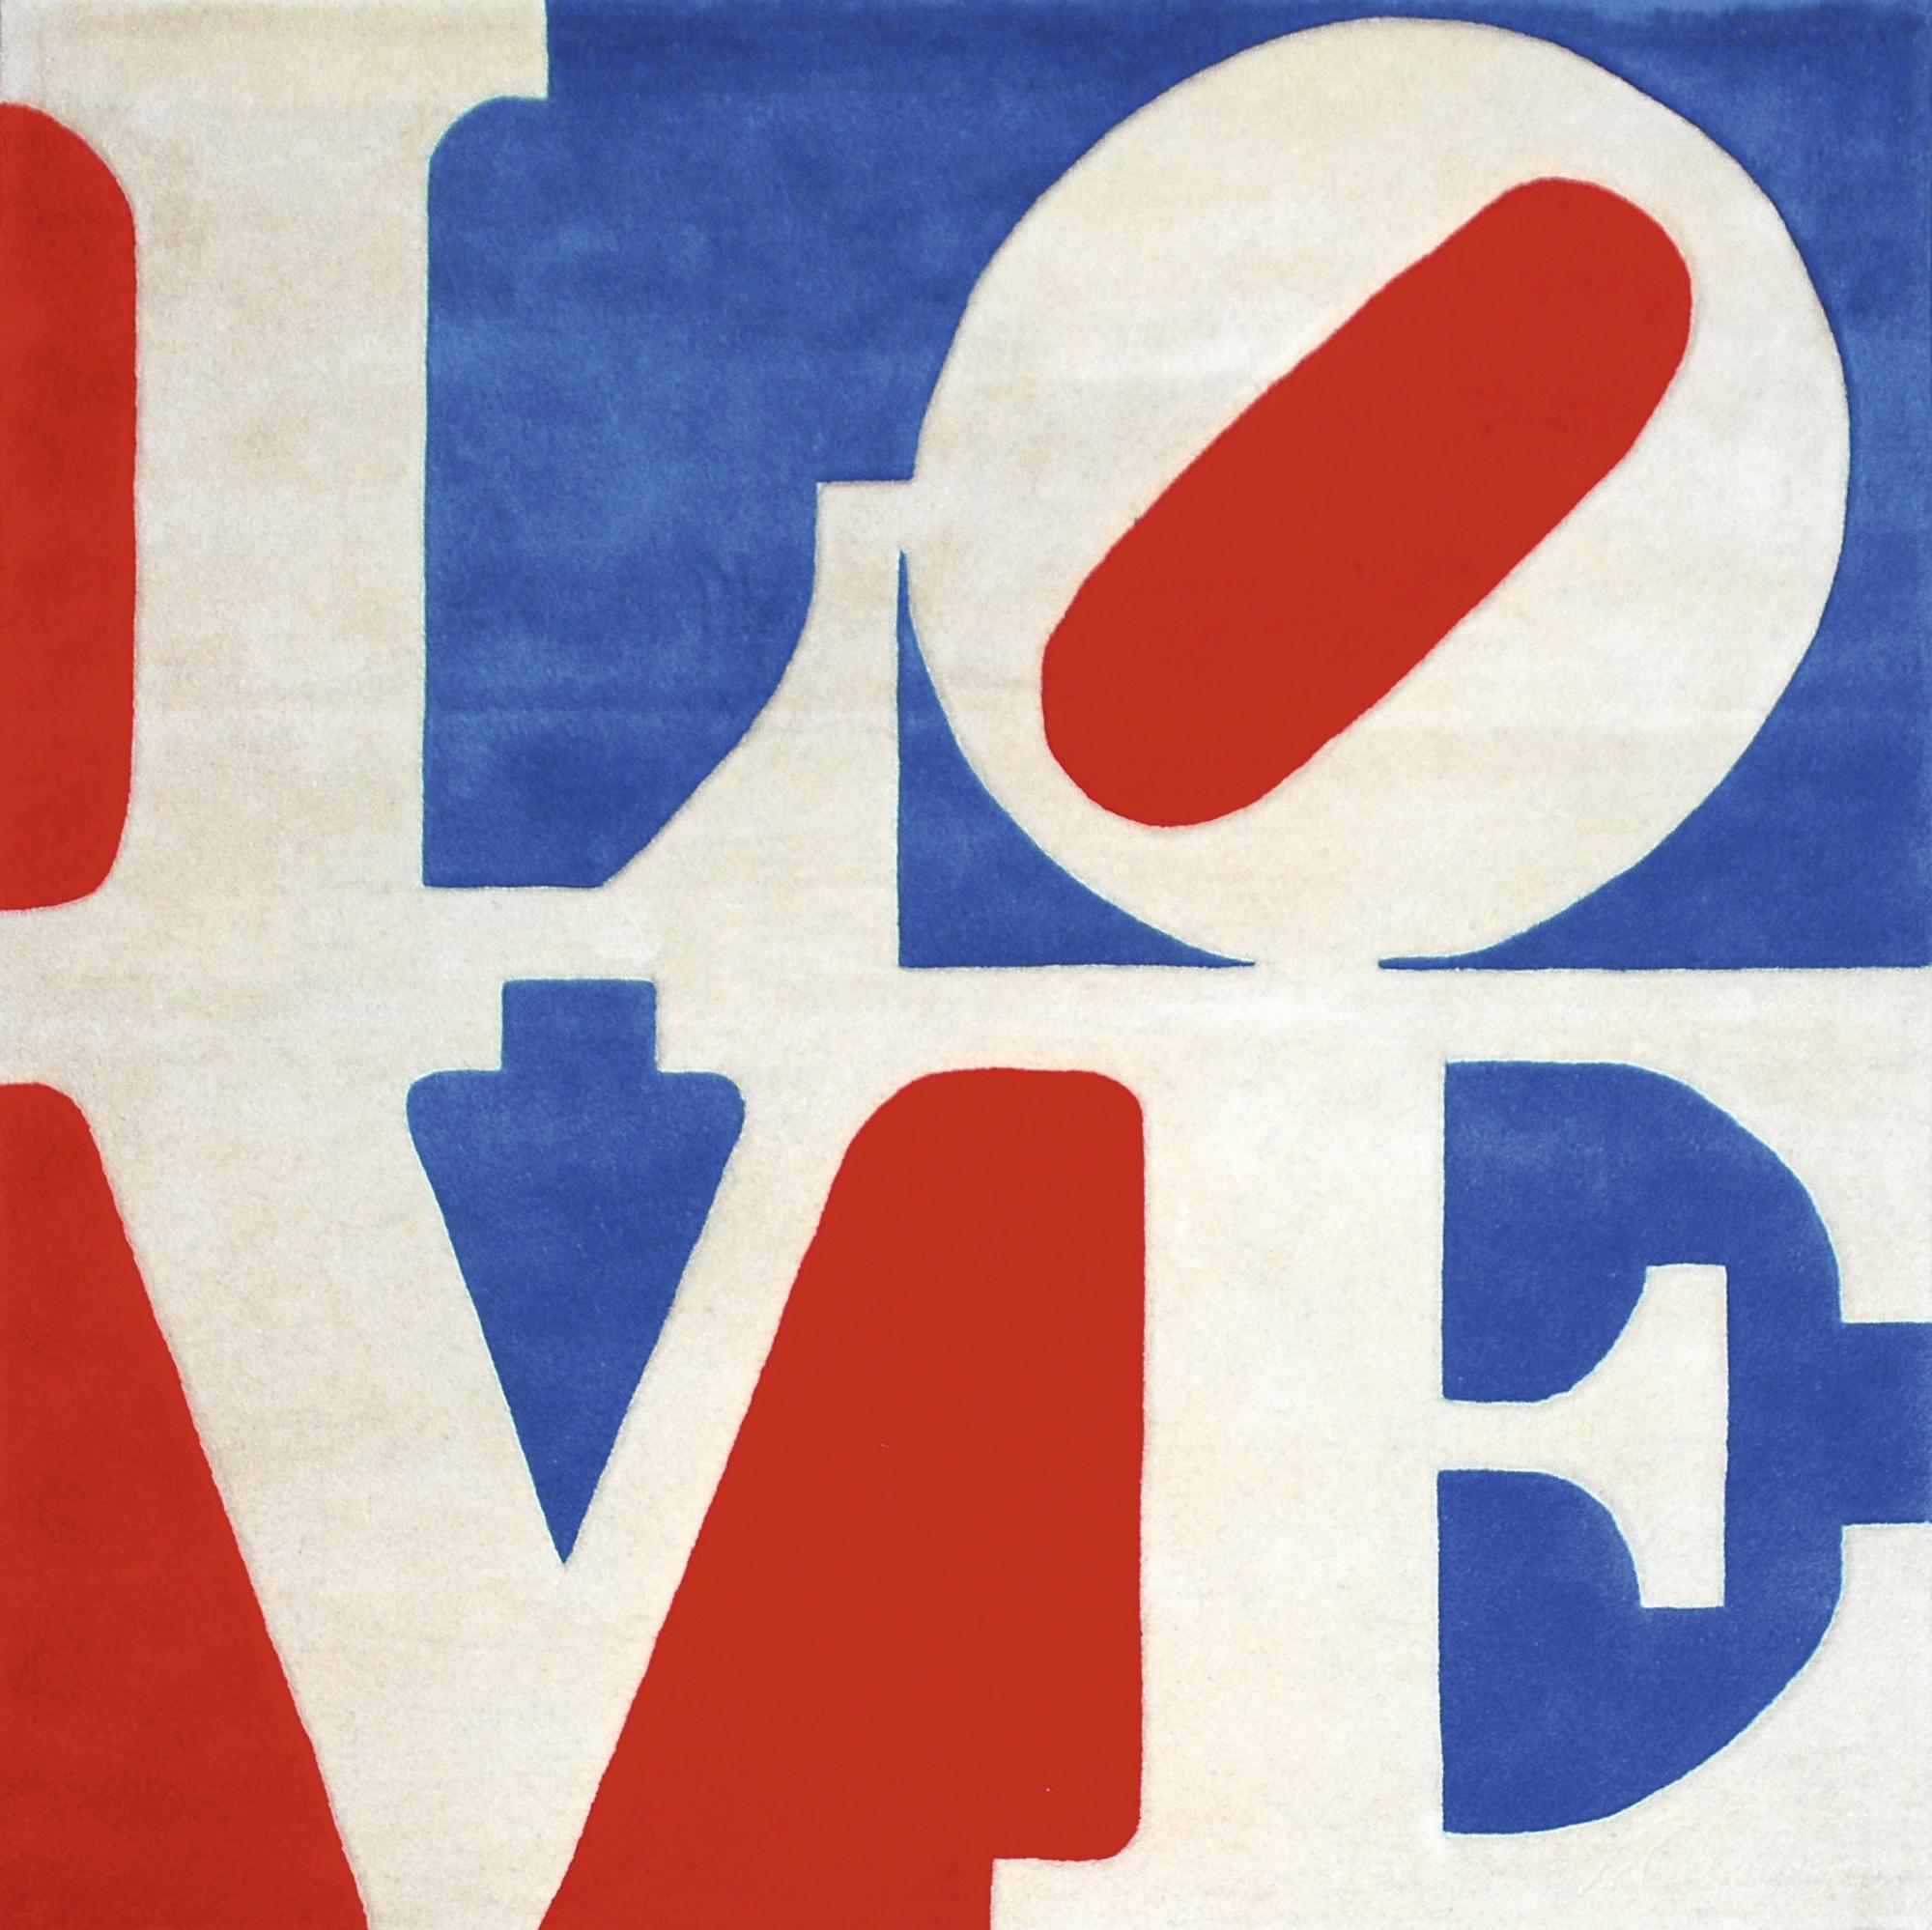 Robert Indiana-Chosen Love-1995